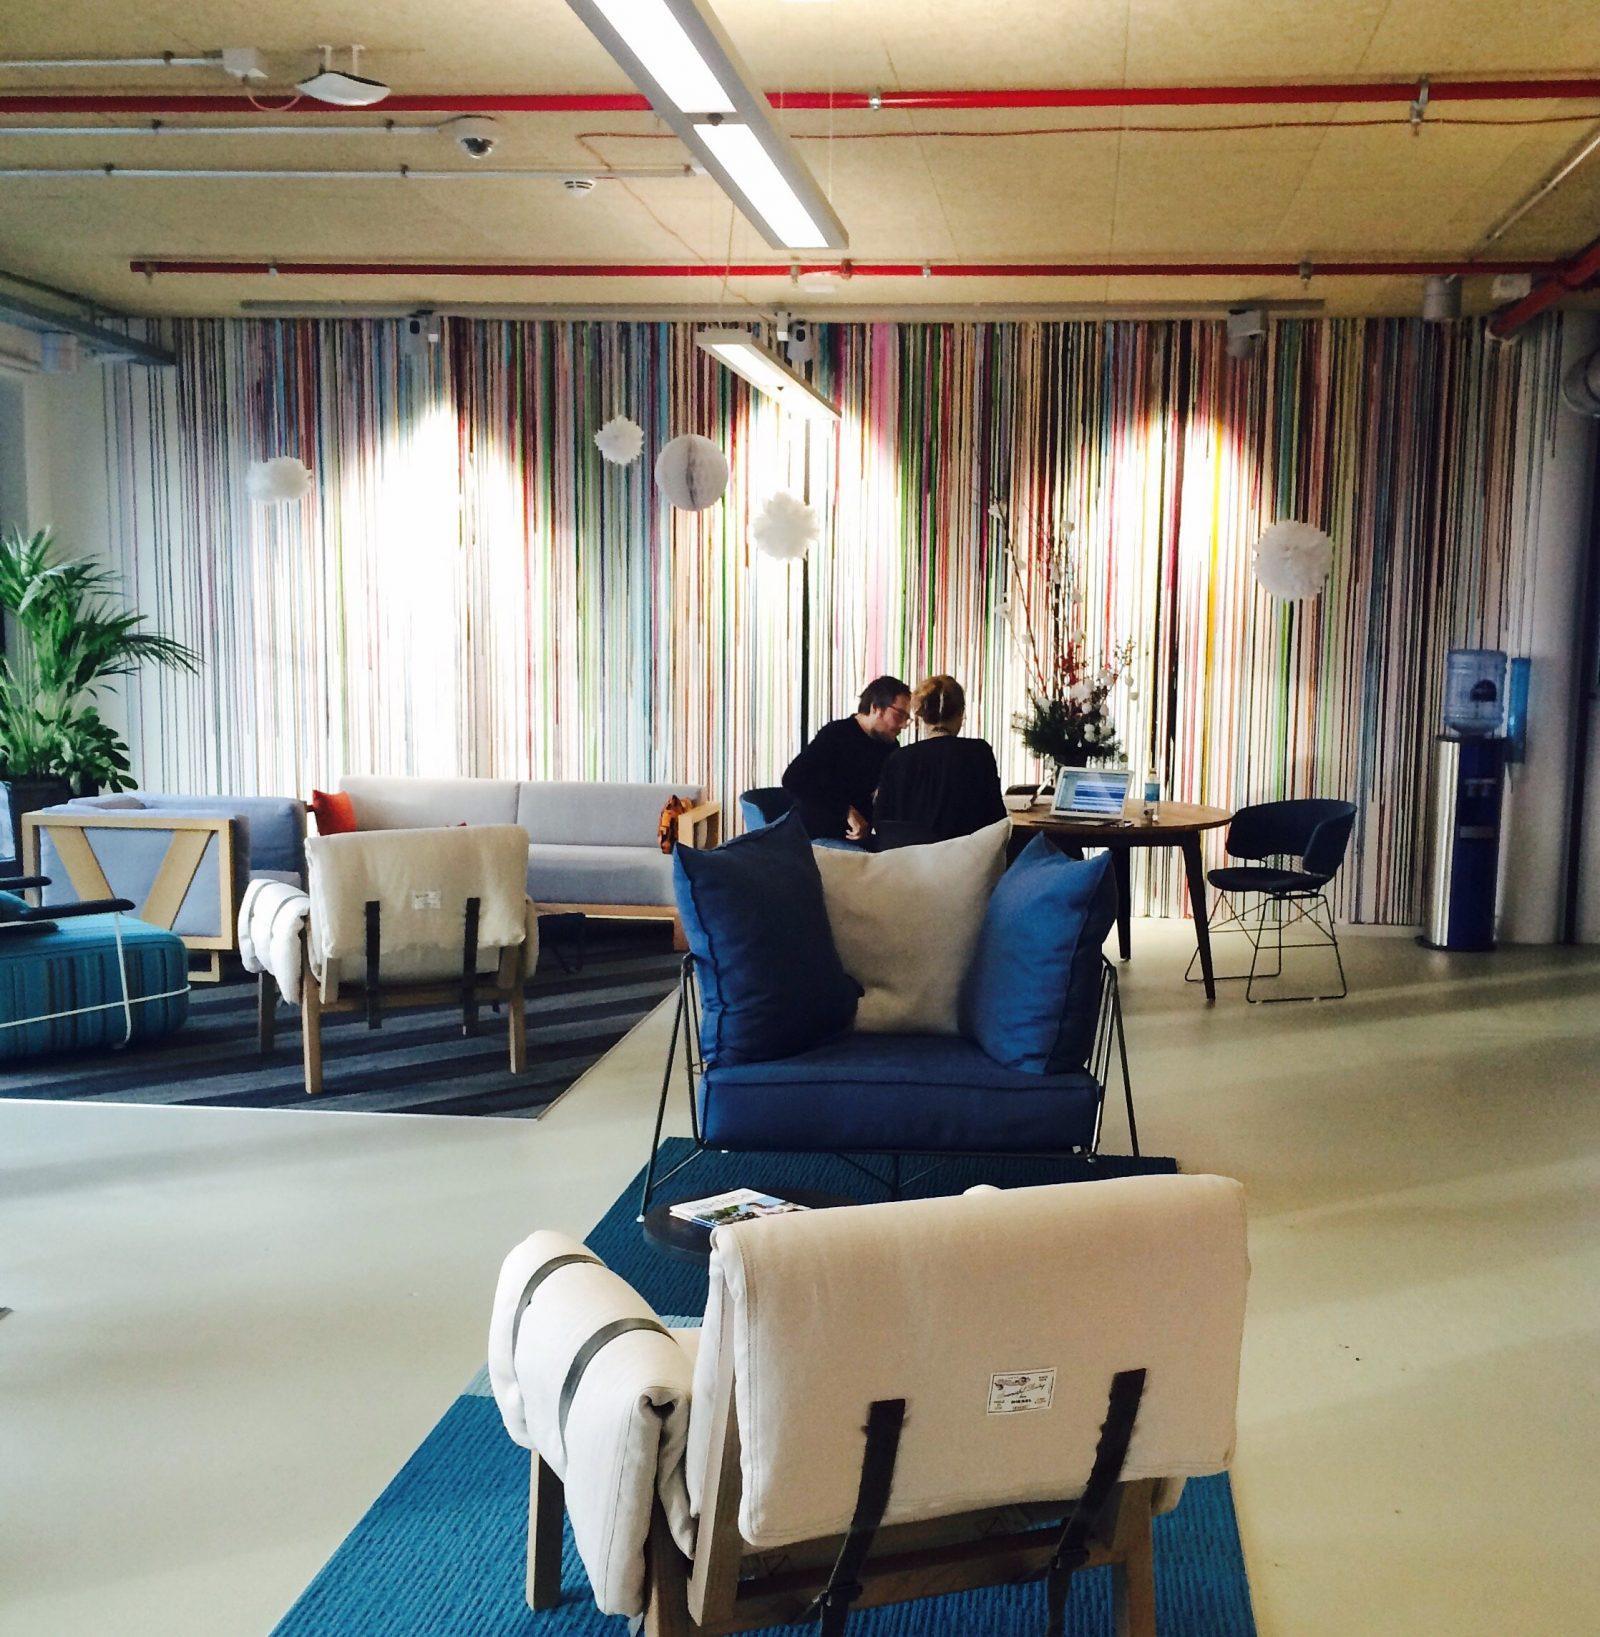 Büro-Atmosphäre bei Facebook Germany